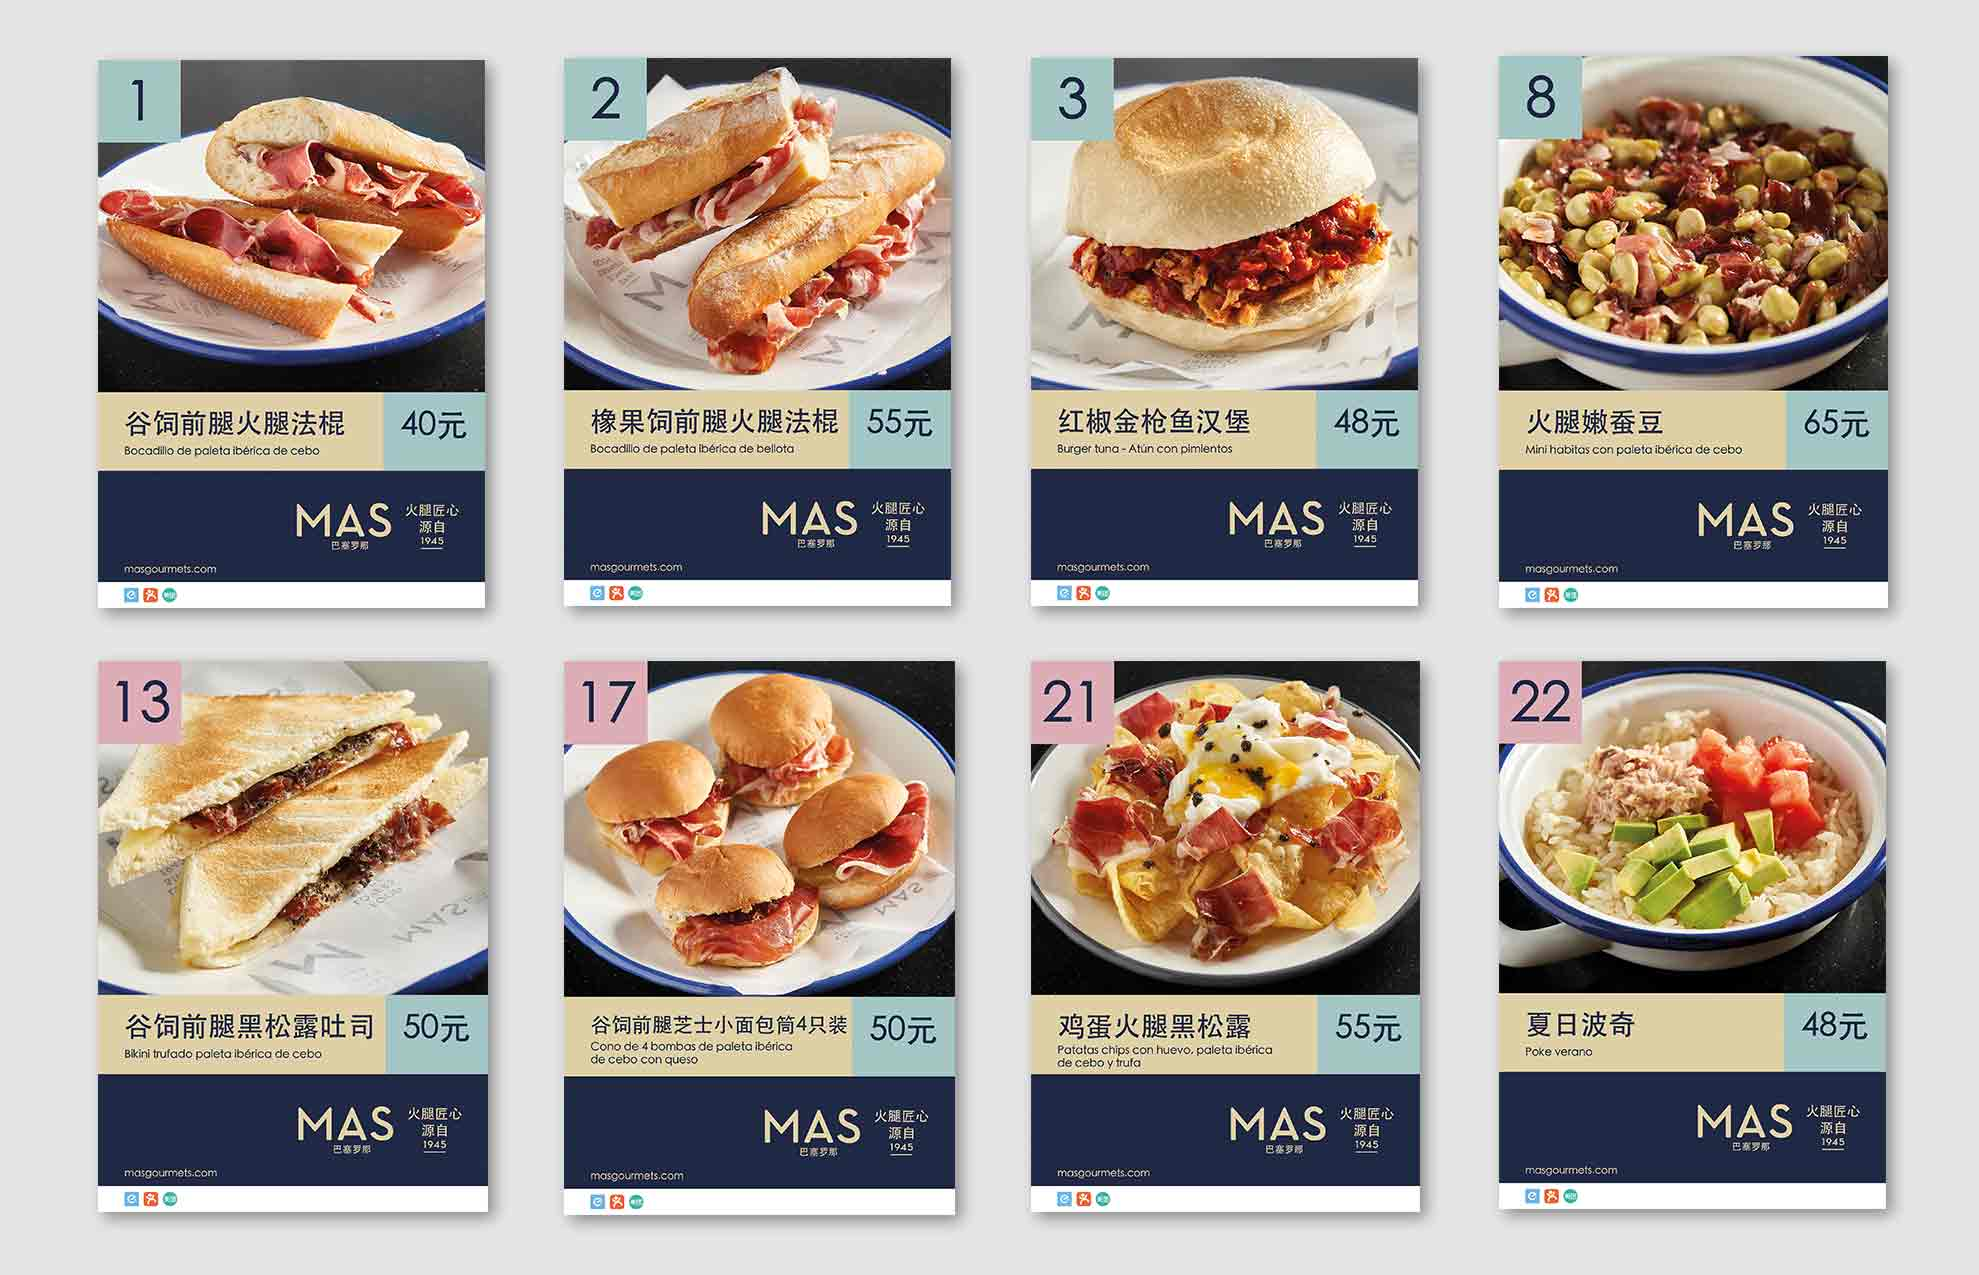 diseno grafico sector gastronomico asia 1 - Estrategia en branding y comunicación comercial para exportar a China